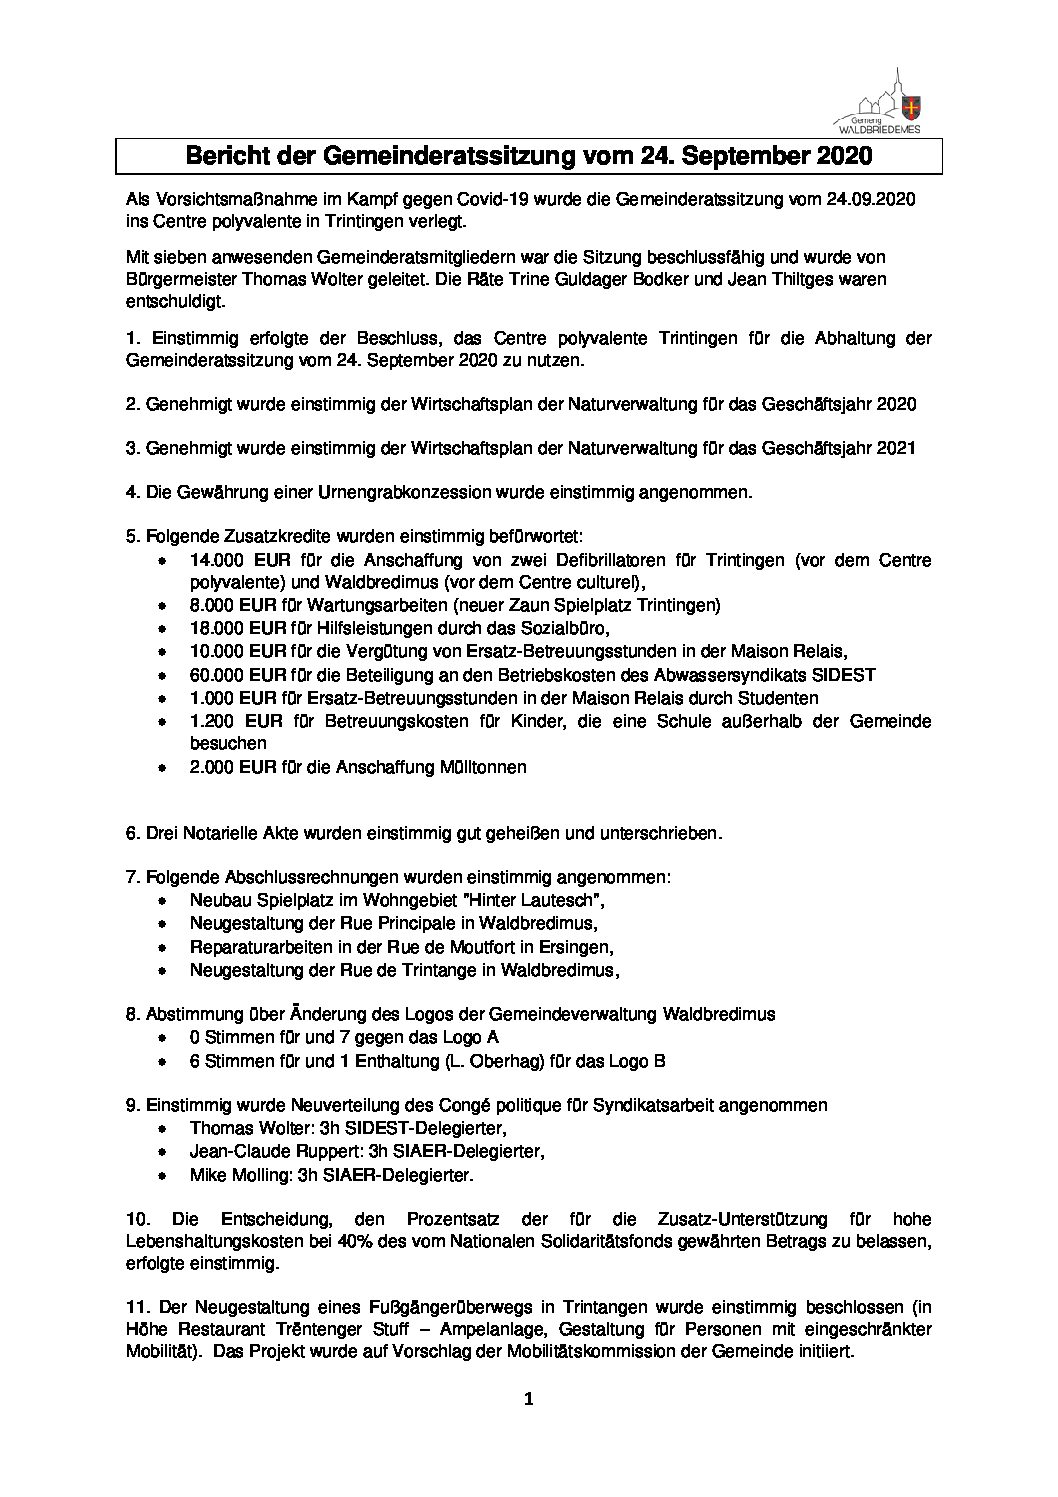 240920 DE Gemeinderatsbericht